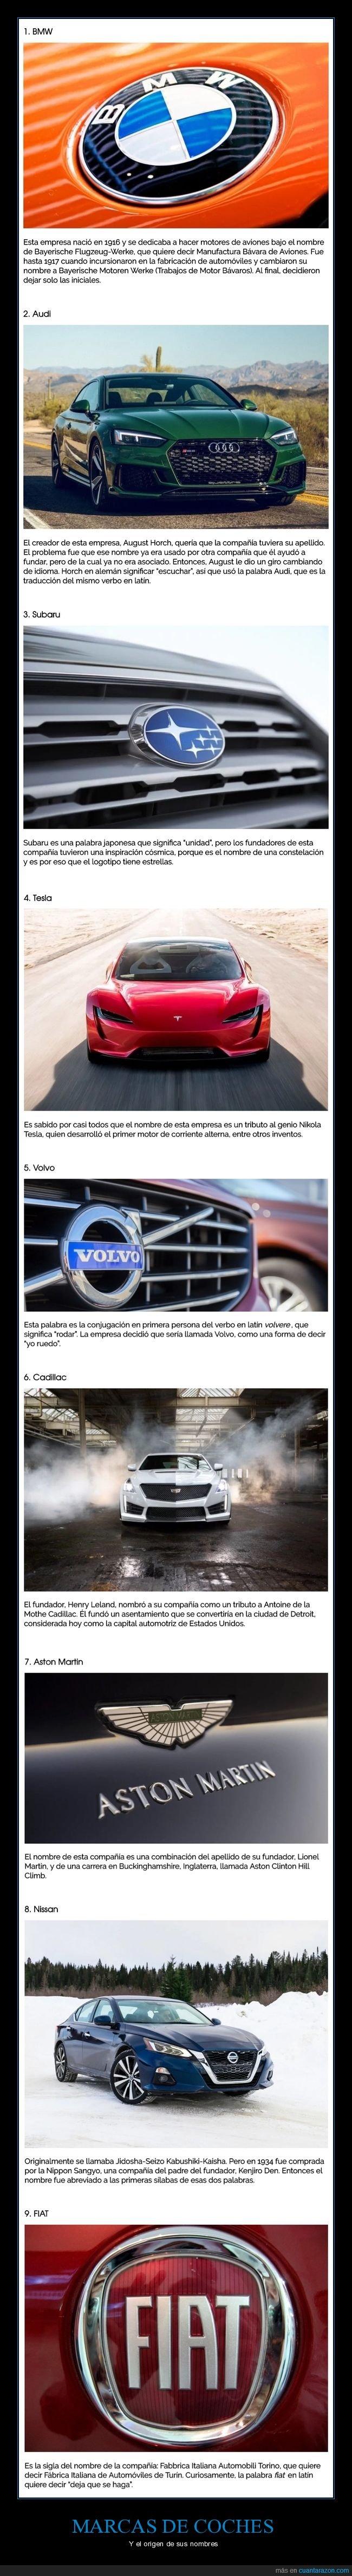 coches,curiosidades,marcas,nombres,origen